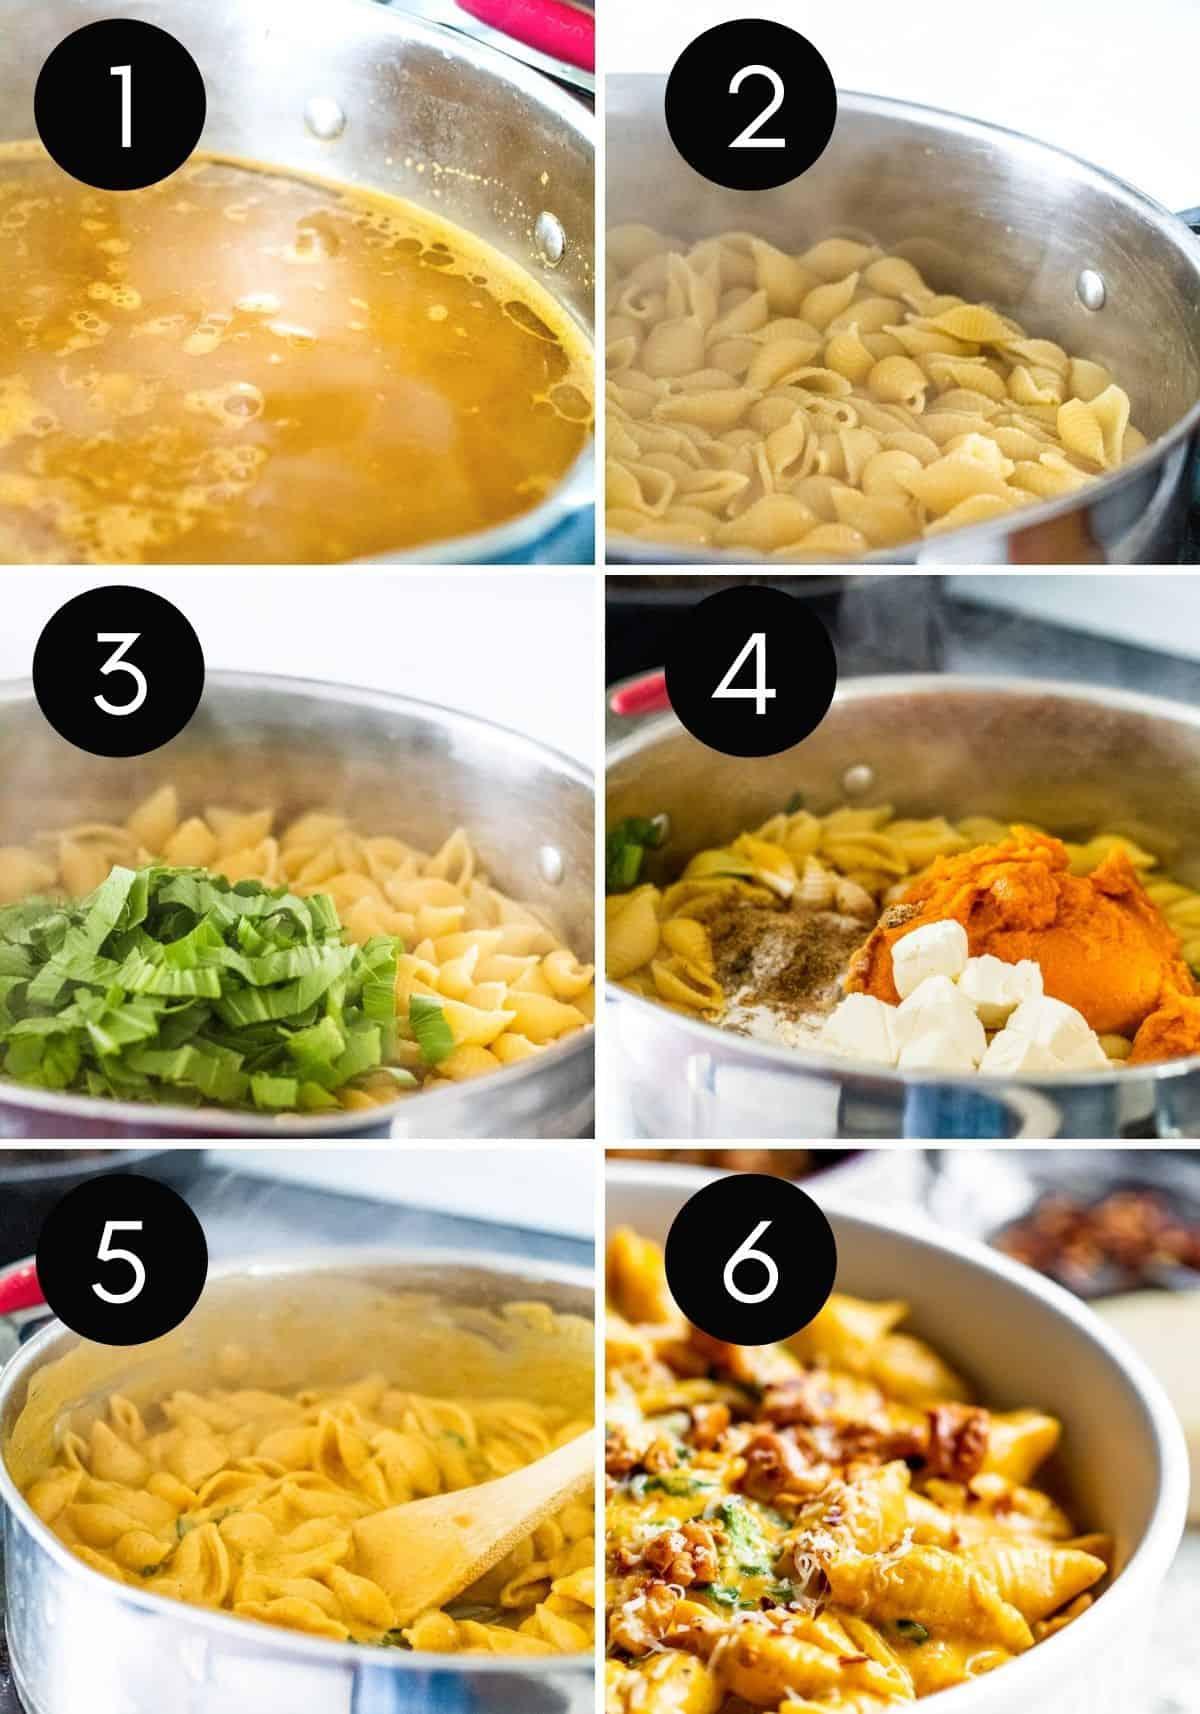 Prep image collage showing steps for making pumpkin pasta.